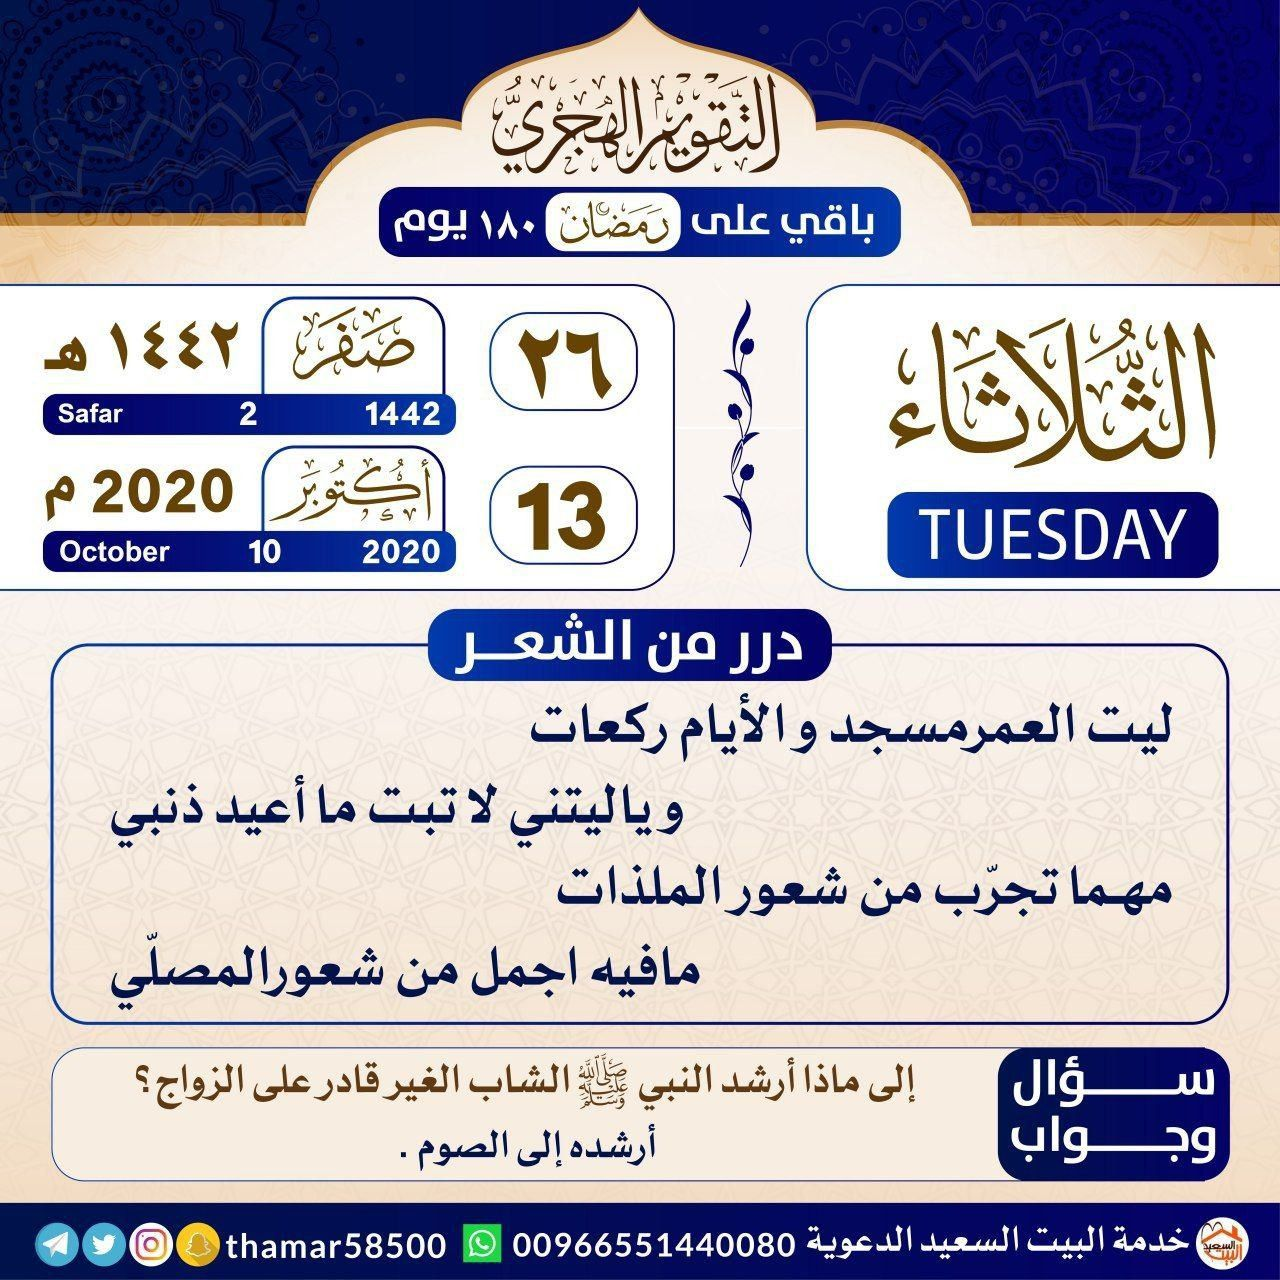 Pin By Marwa Amin On التقويم الهجري In 2020 13 October October 10 10 Things